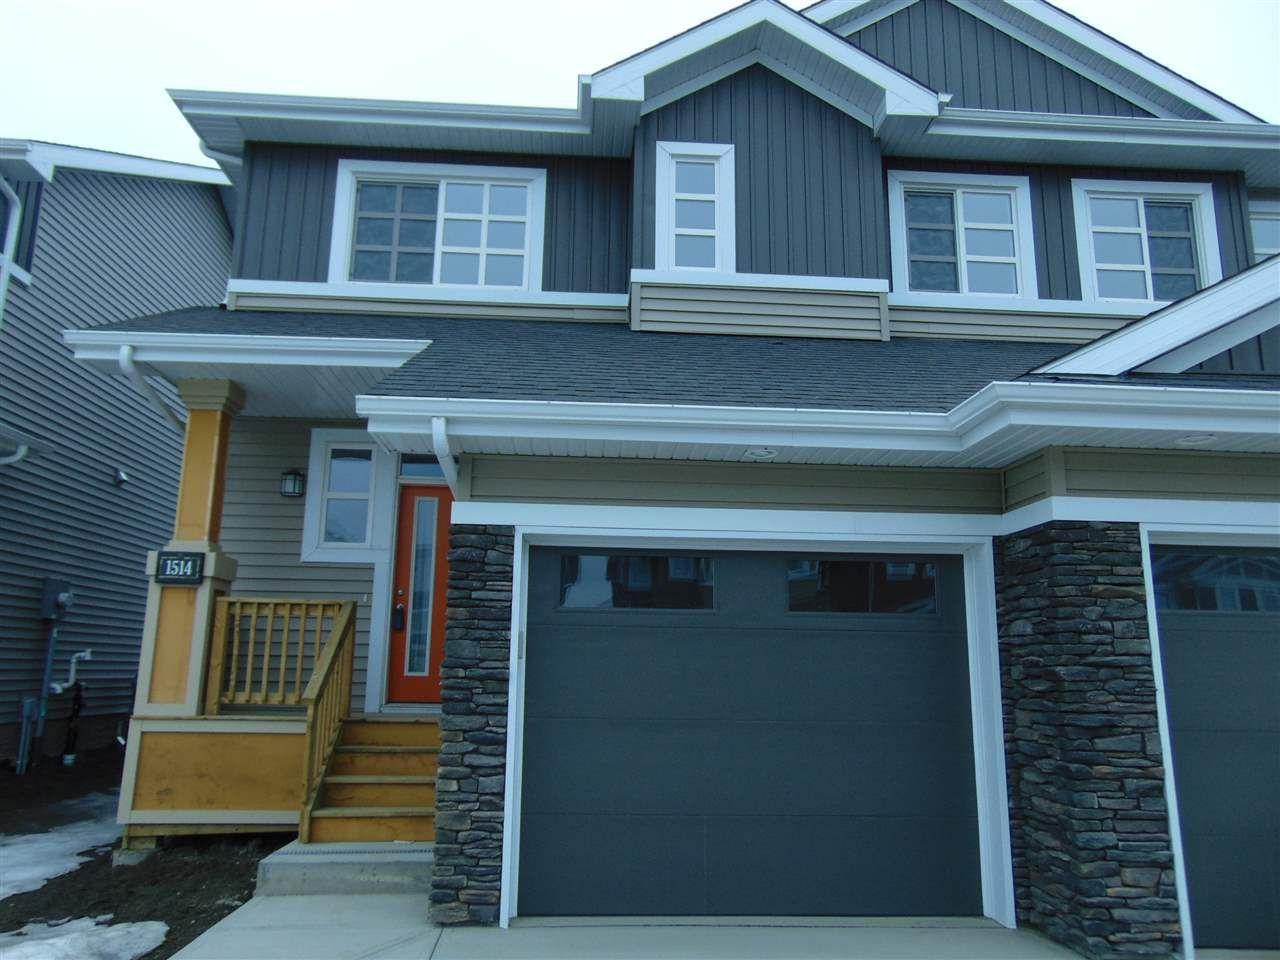 Main Photo: 1514 169 Street in Edmonton: Zone 56 House Half Duplex for sale : MLS®# E4148674